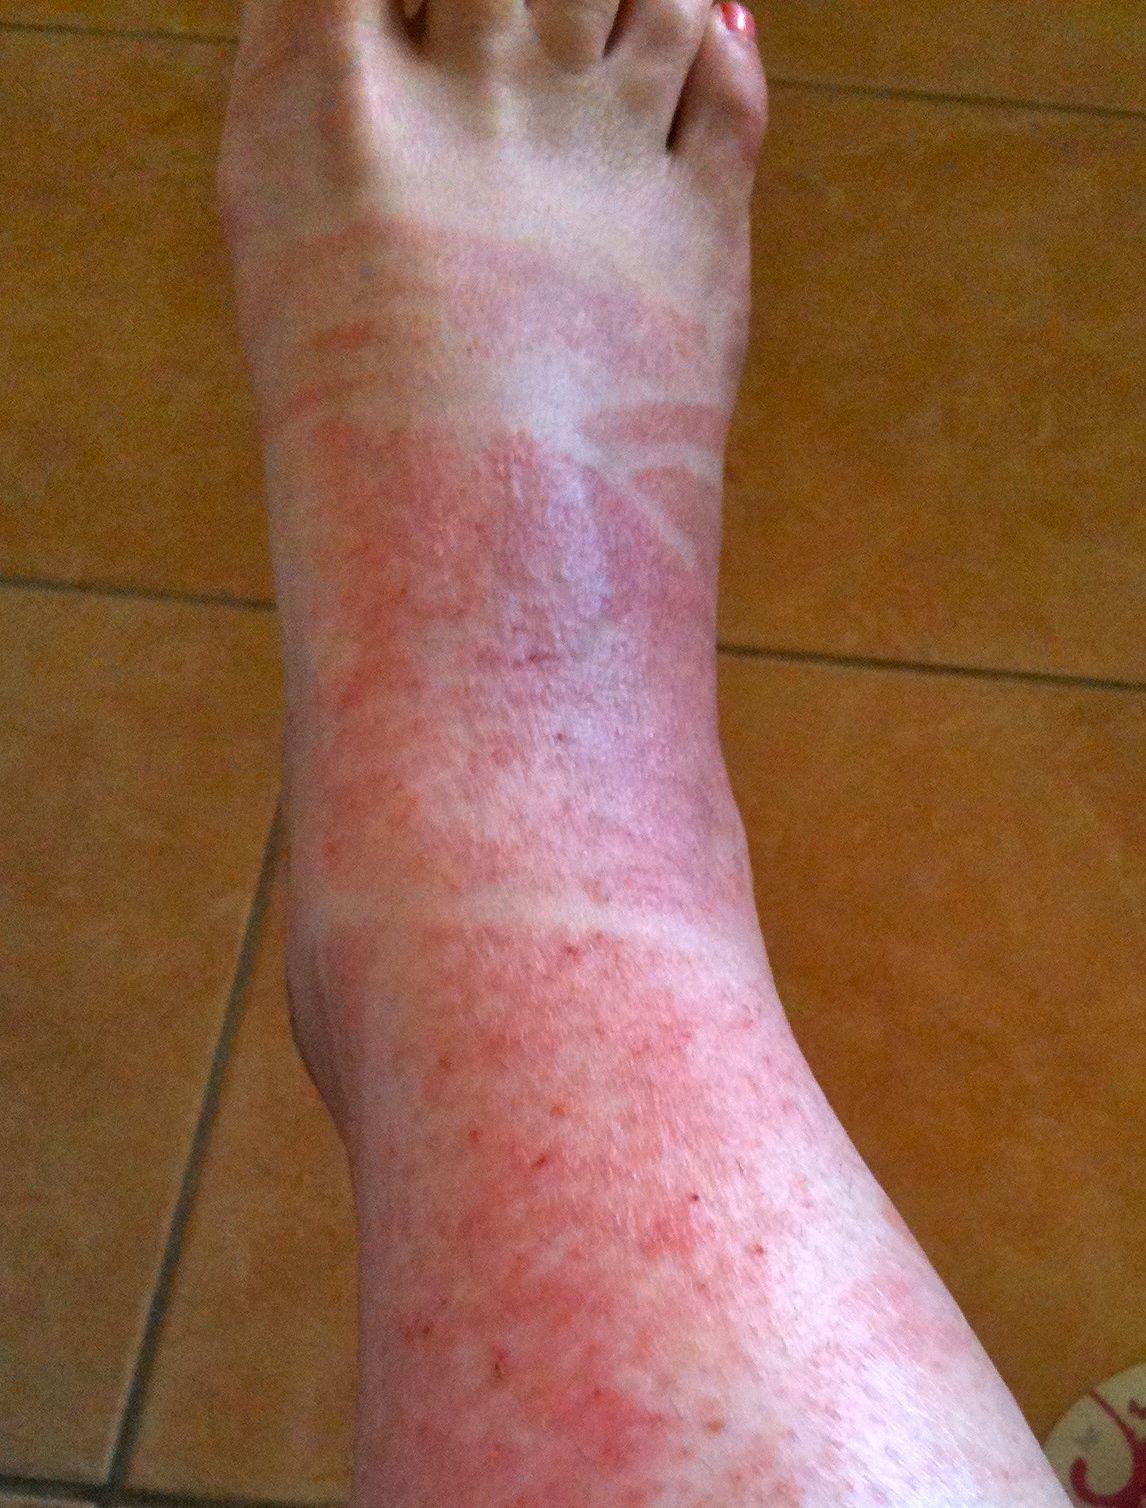 Sunburn (Sun Poisoning) Symptoms, Treatment, Causes - What ...